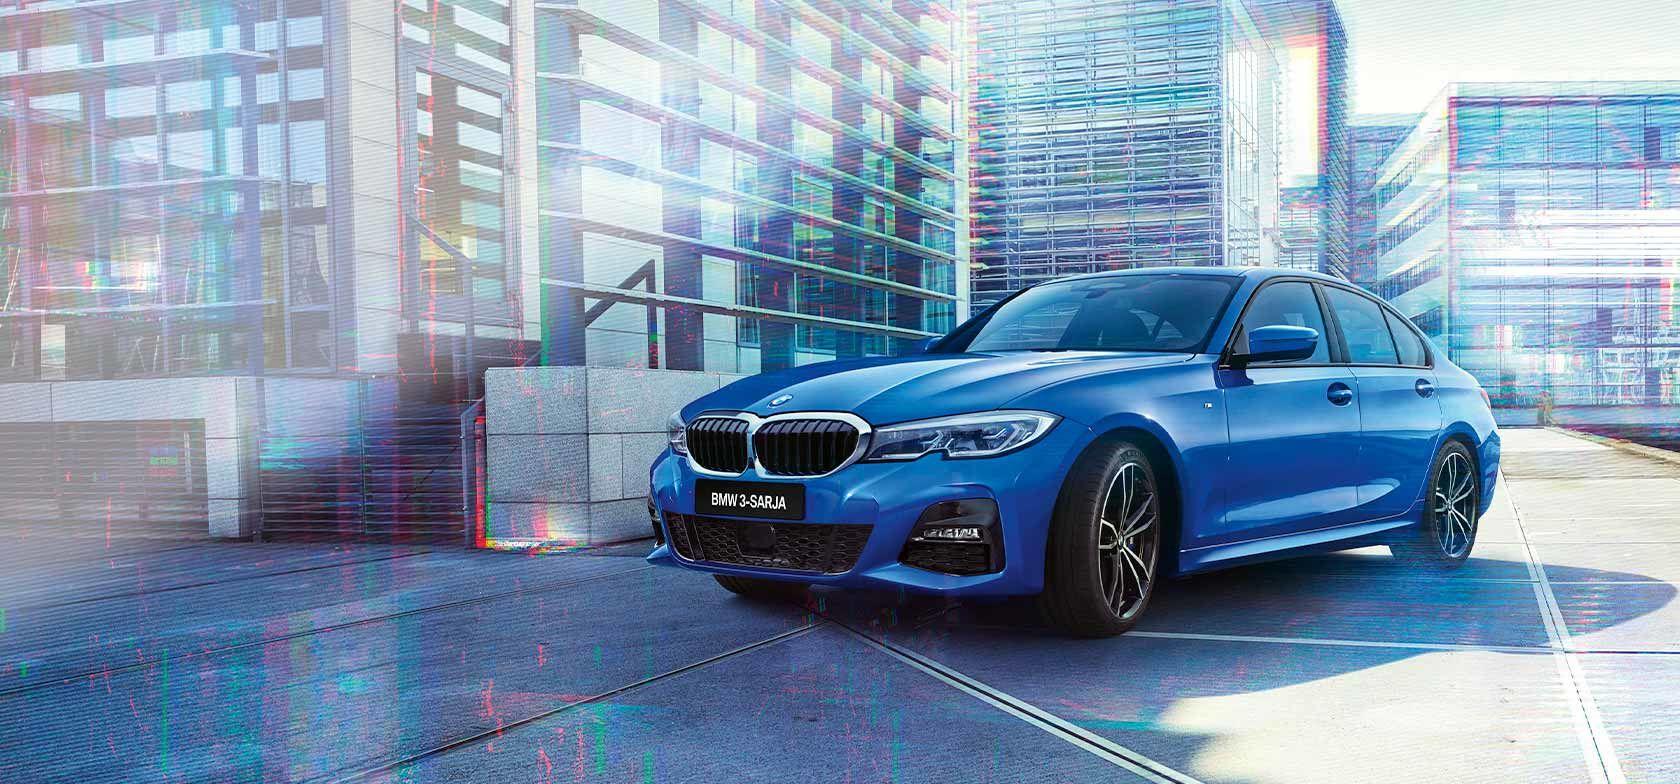 UUSI BMW 3-SARJAN SEDAN.